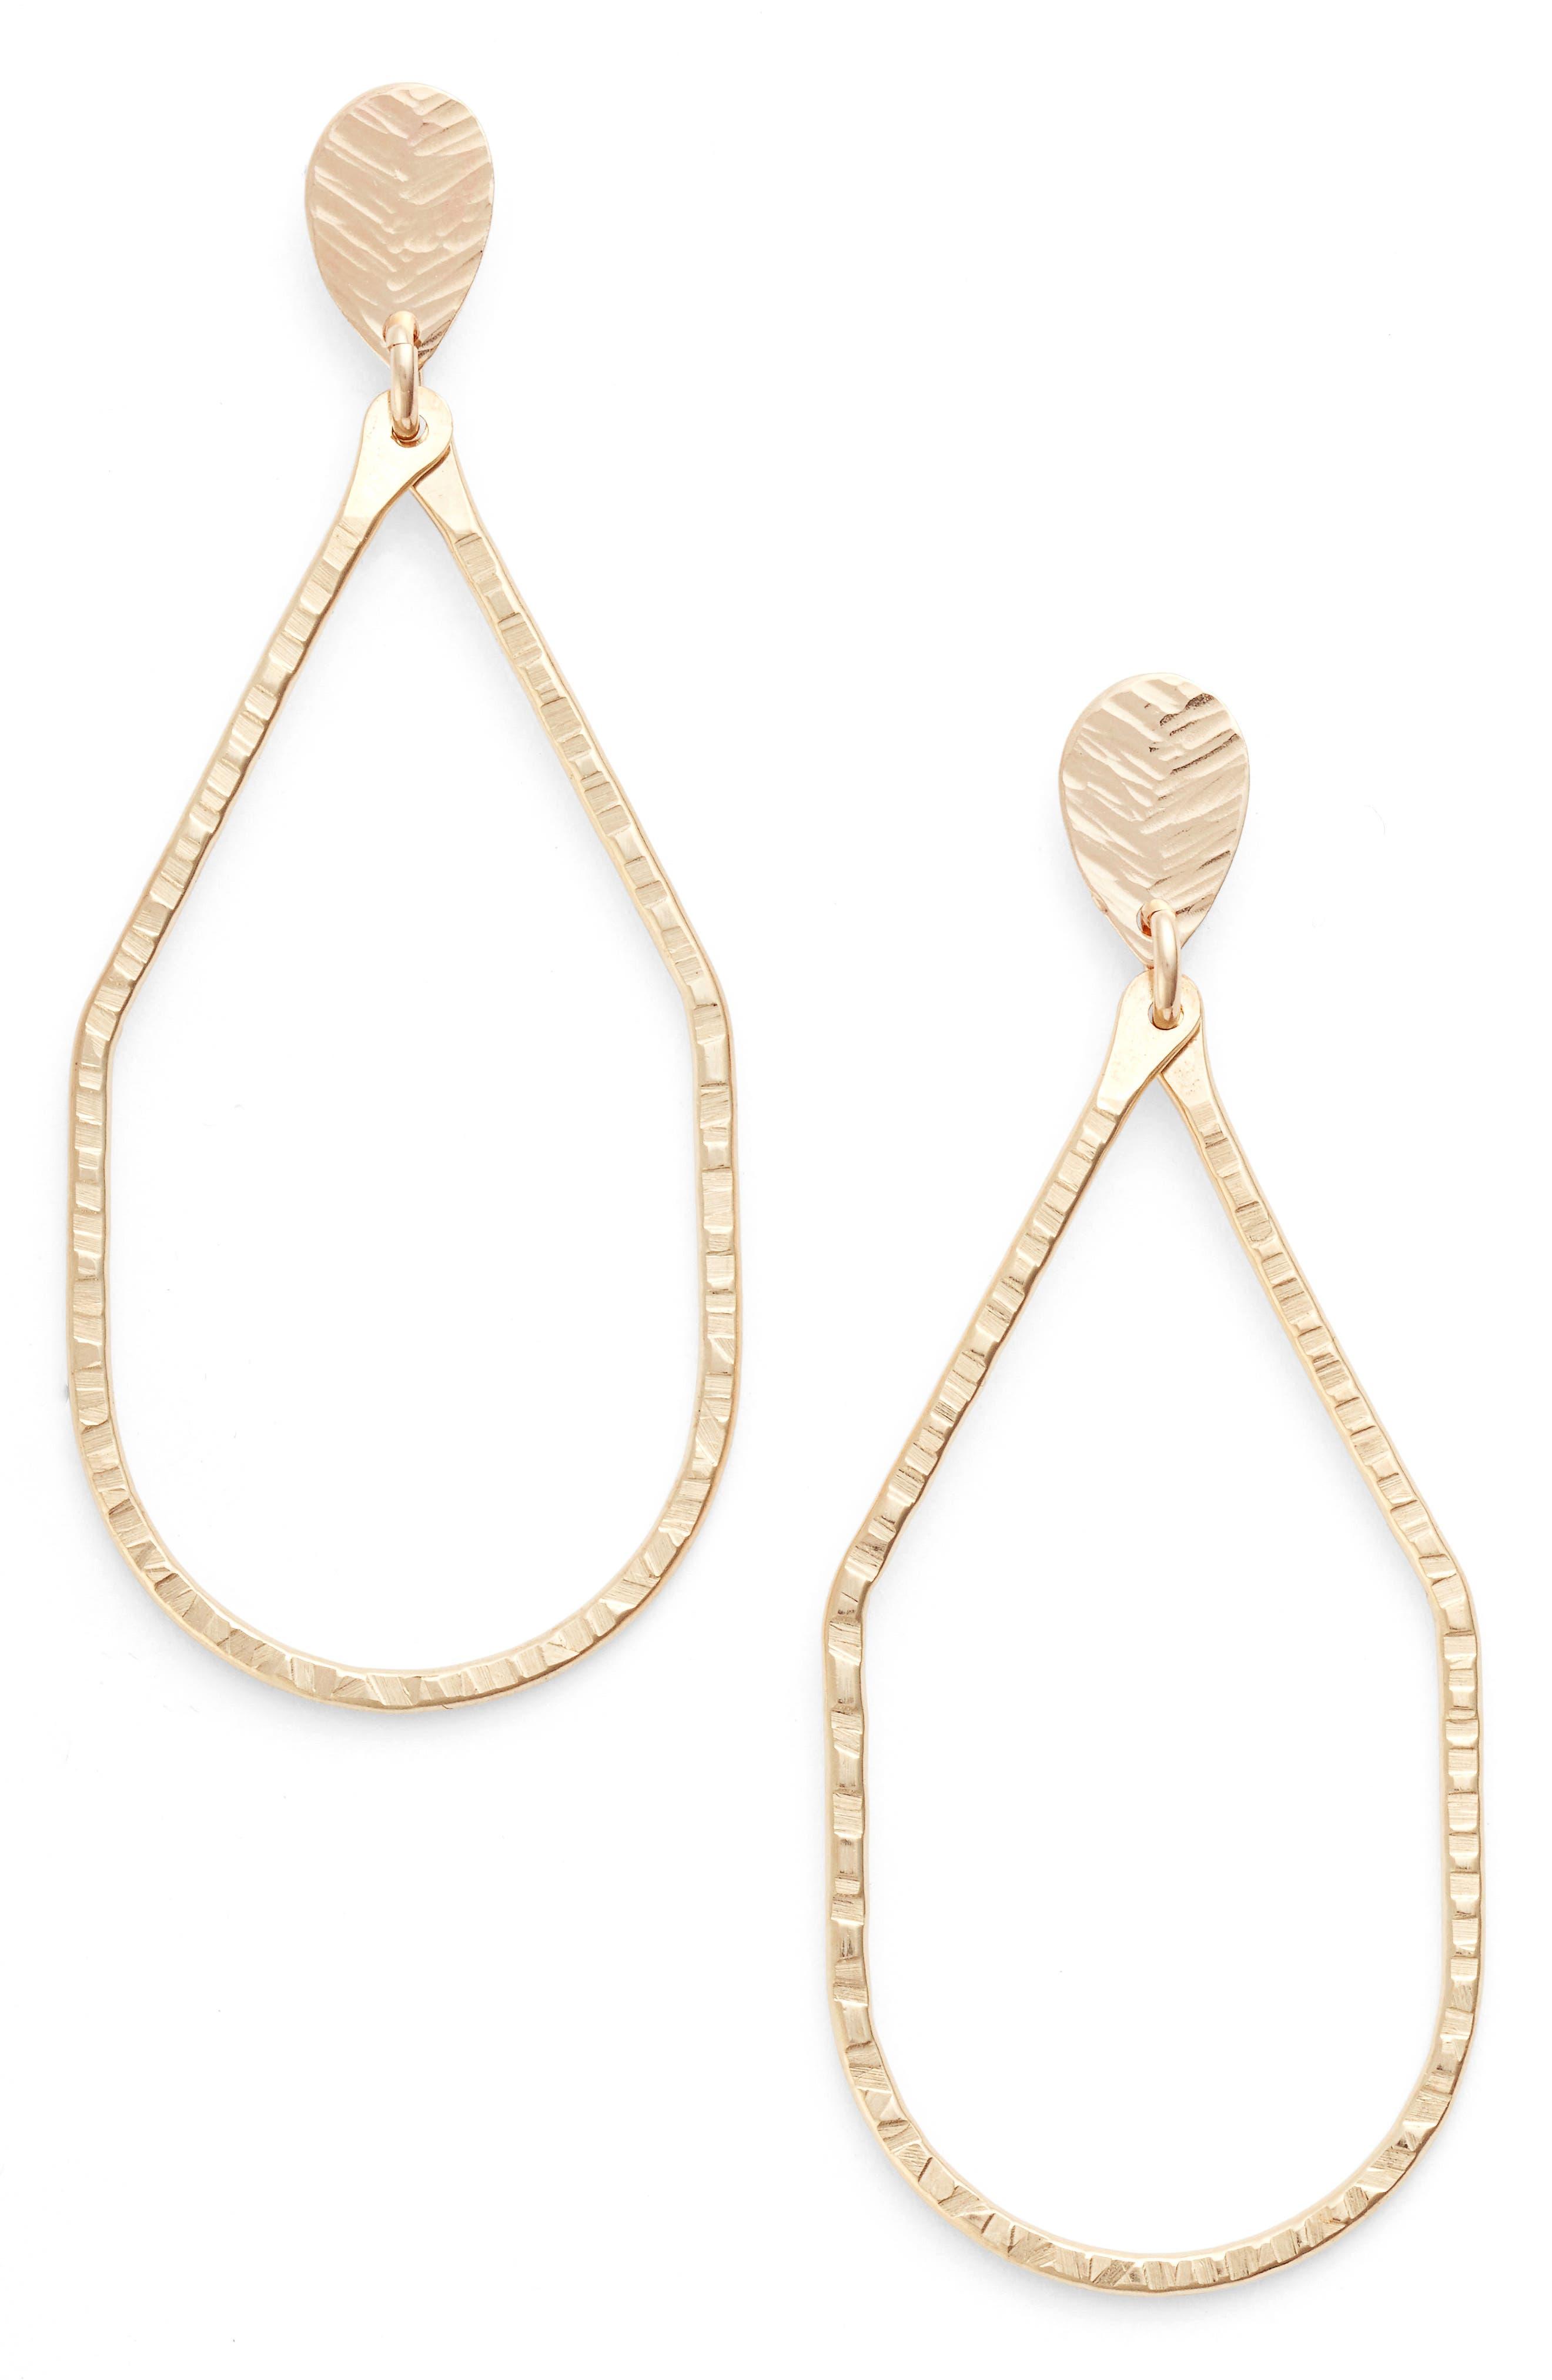 Nashelle Hammered Drop Earrings